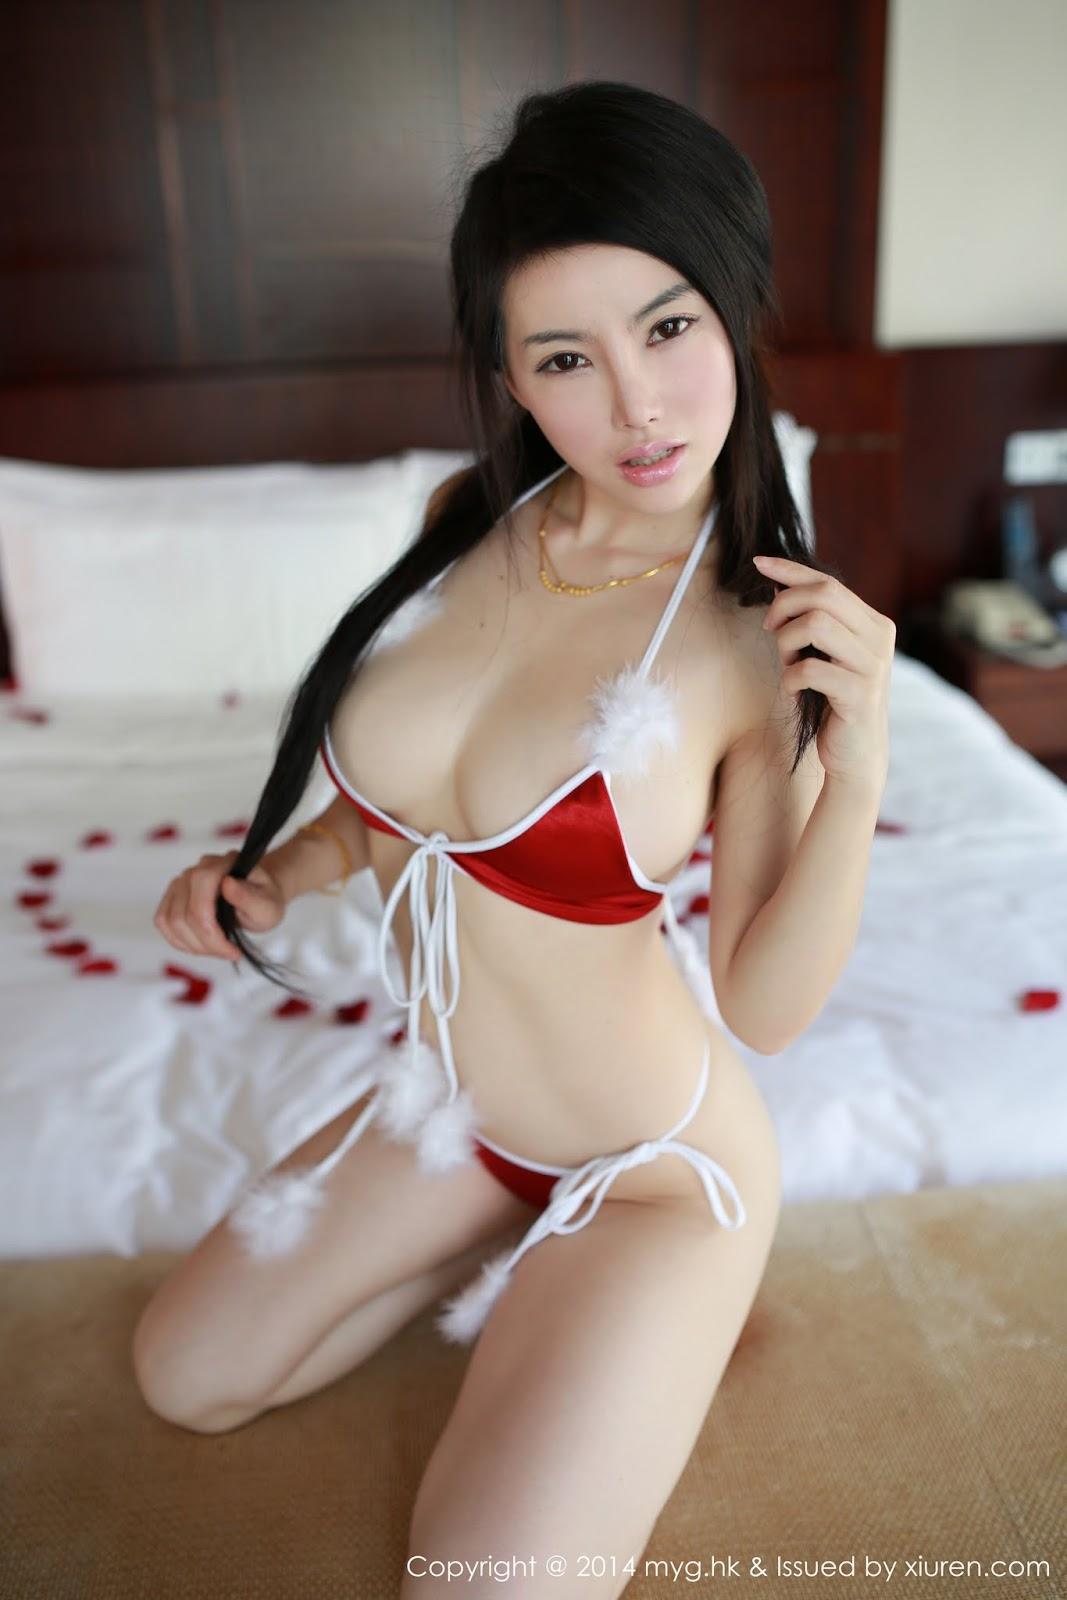 30015 036 - MYGIRL VOL.30 Photo Nude Hot Sexy